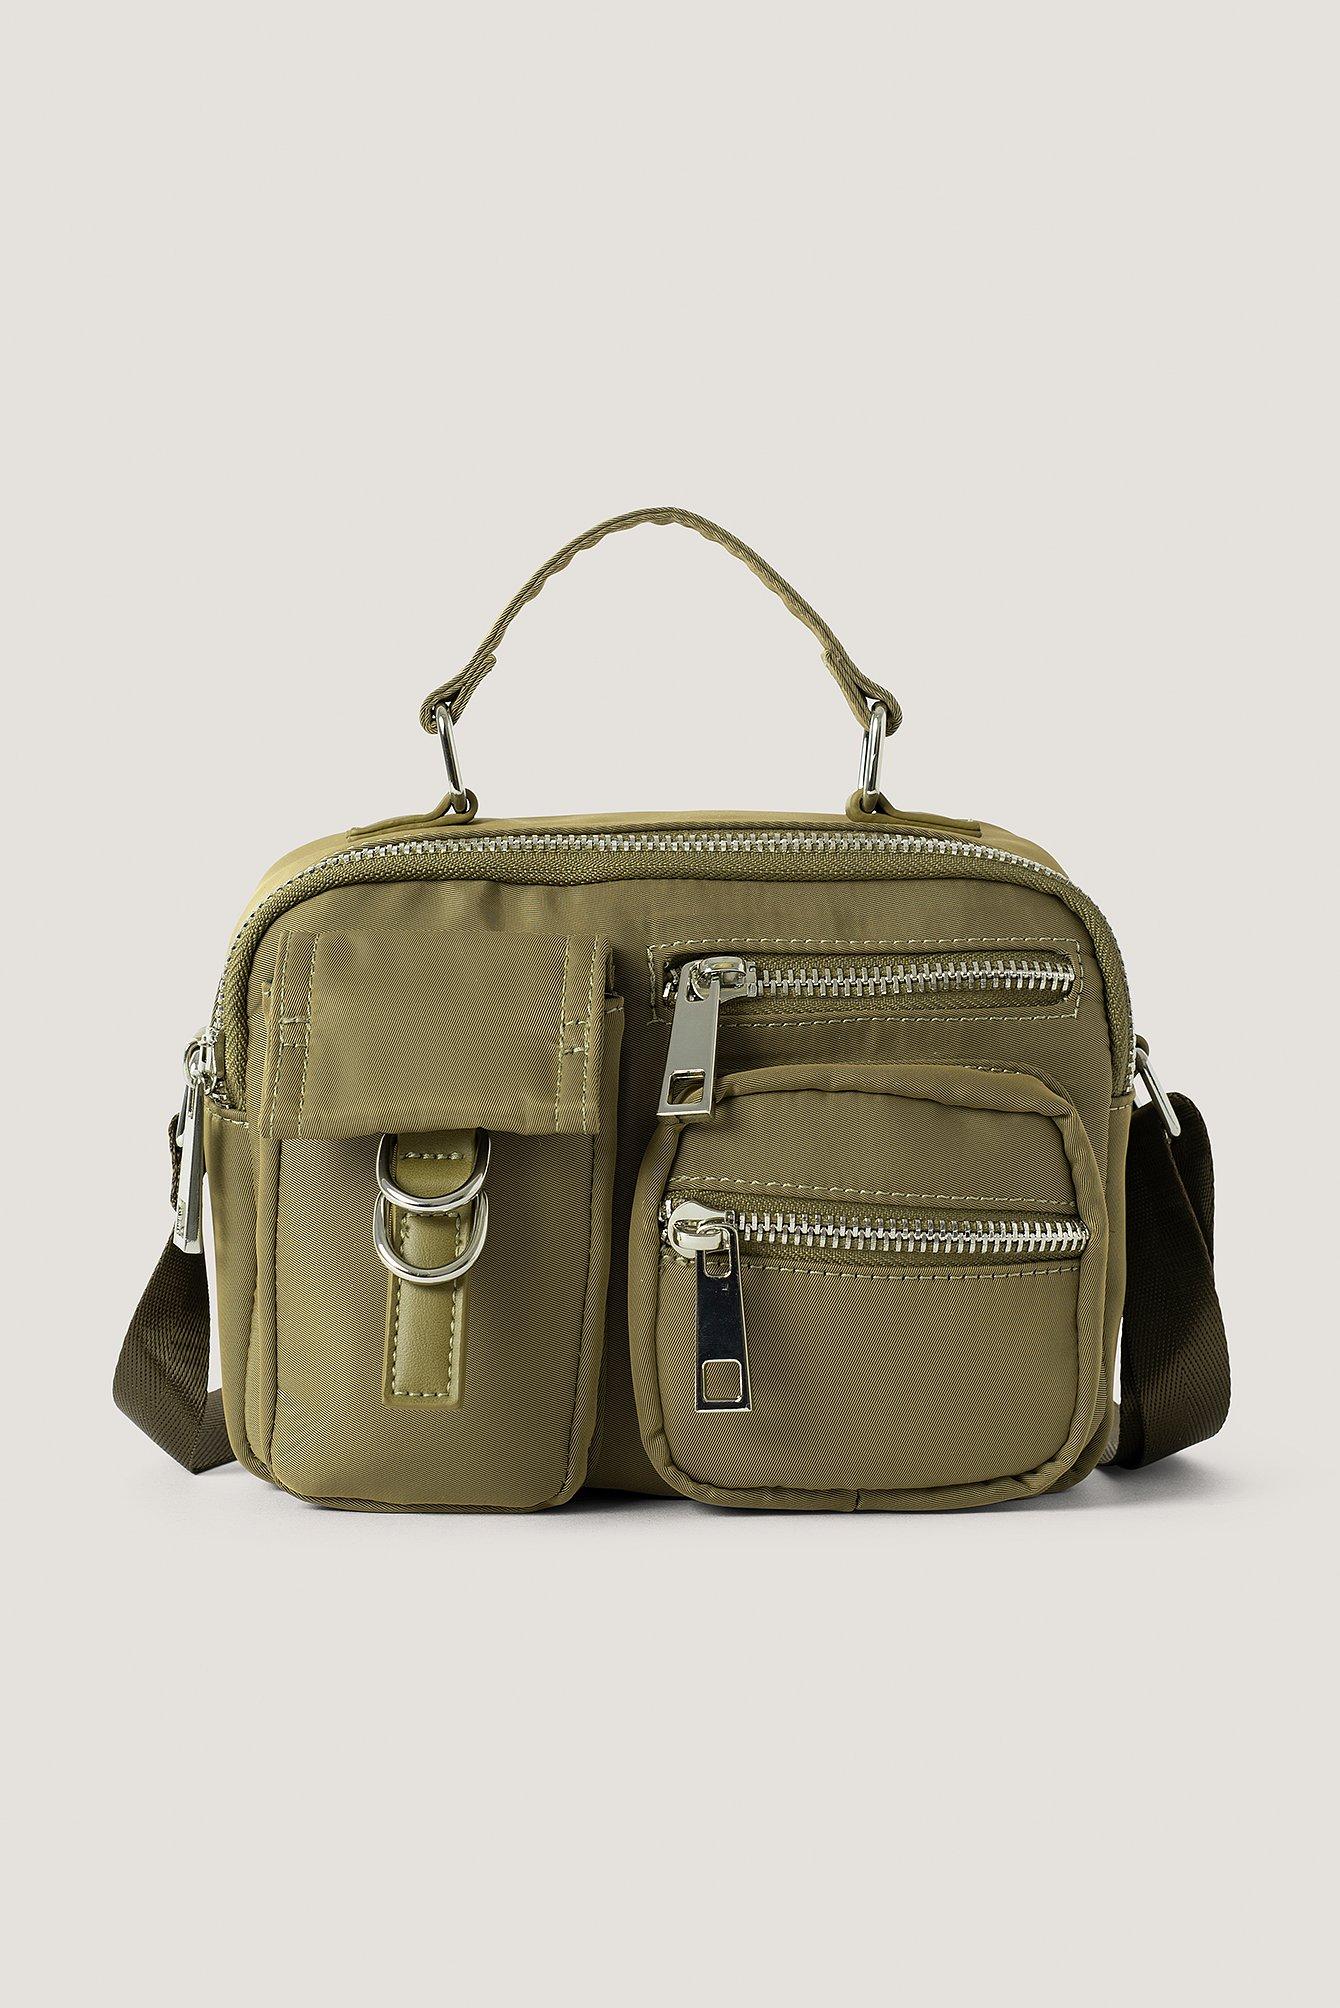 na-kd accessories -  Nylon-Crossbody-Tasche - Green